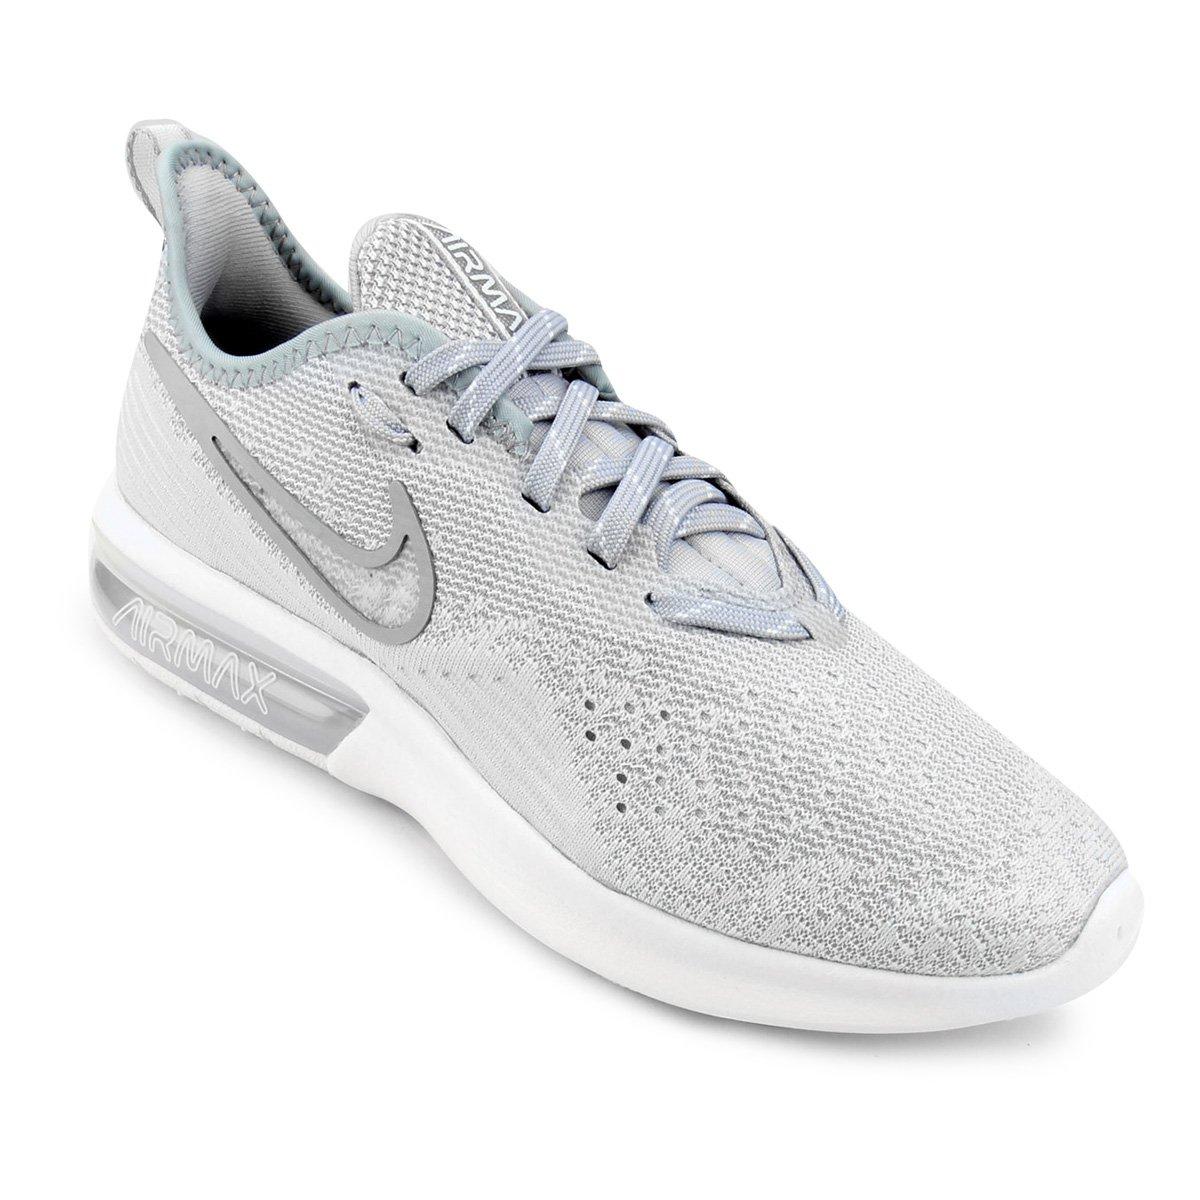 Tênis E Air 4 Branco Feminino Nike Max Sequent Cinza 5Rj3AL4